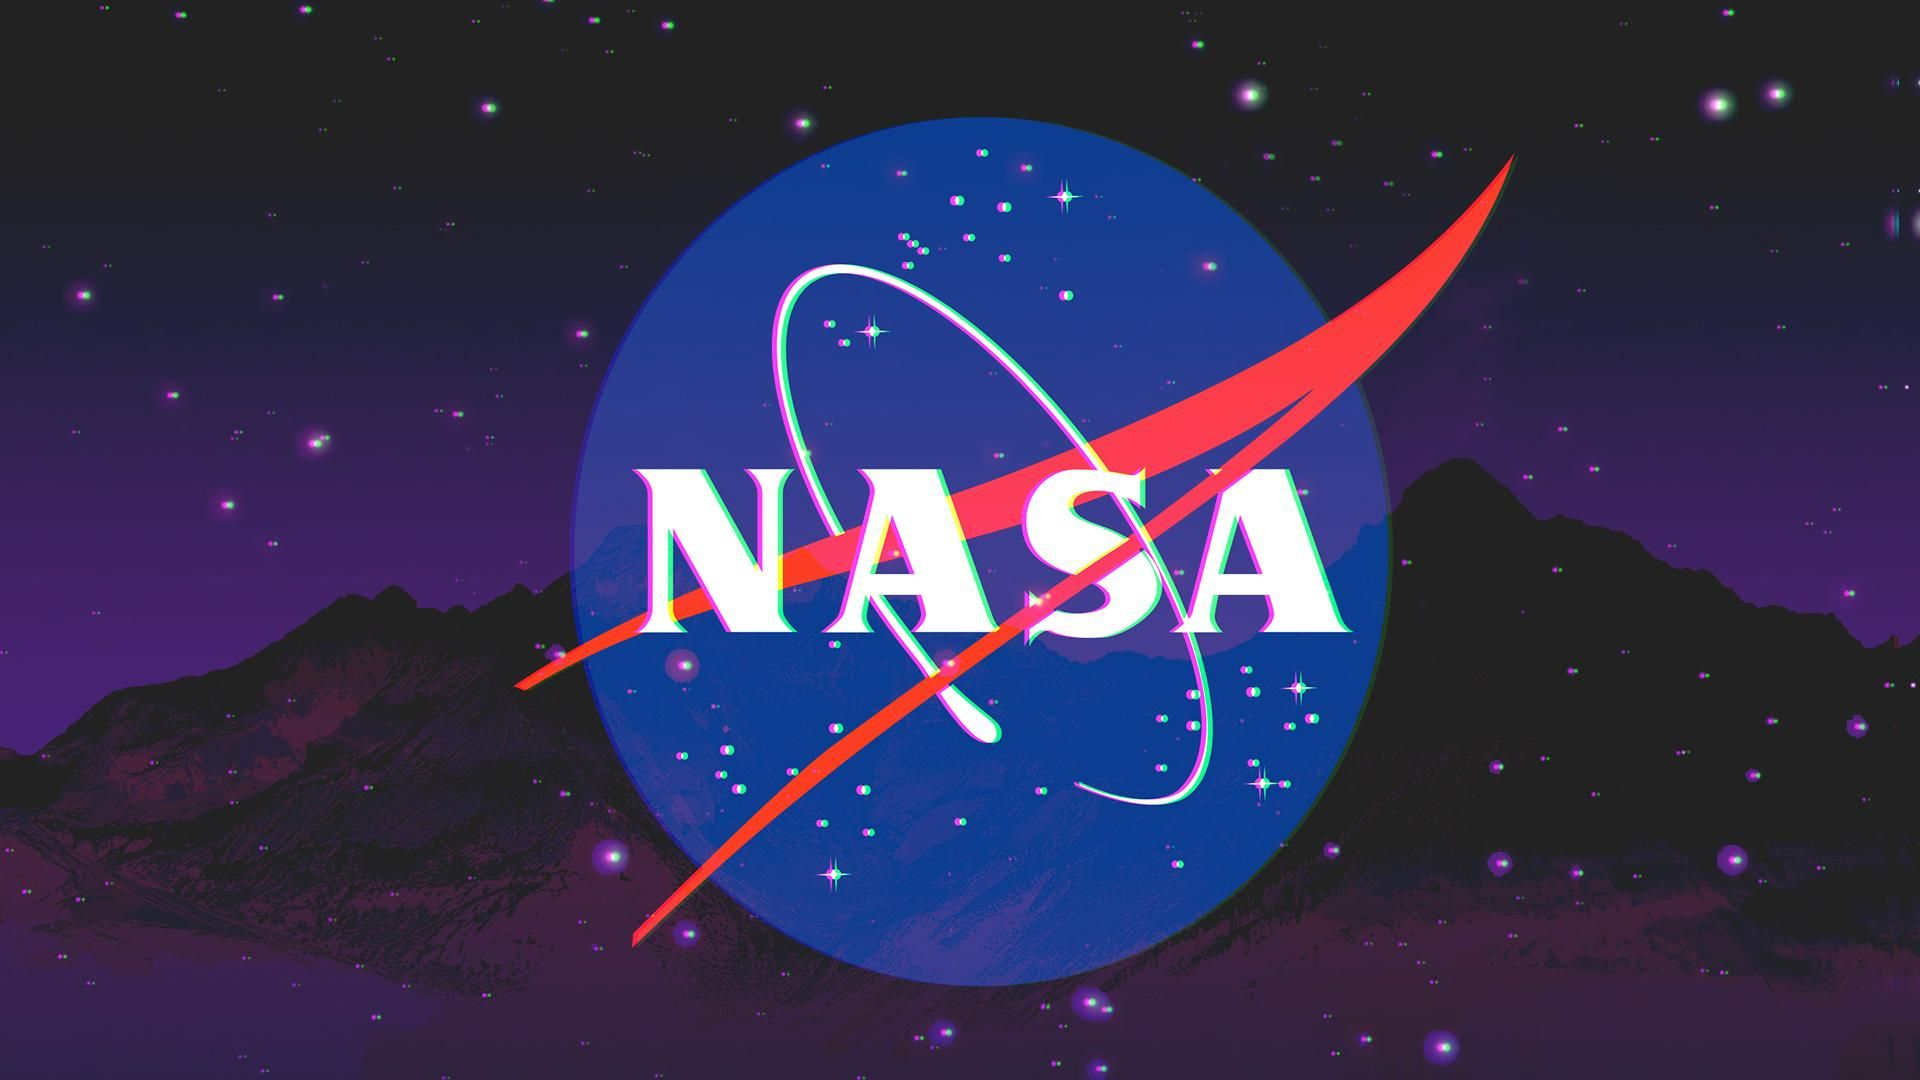 NASA [1920x1080] Nasa wallpaper, Desktop wallpaper art